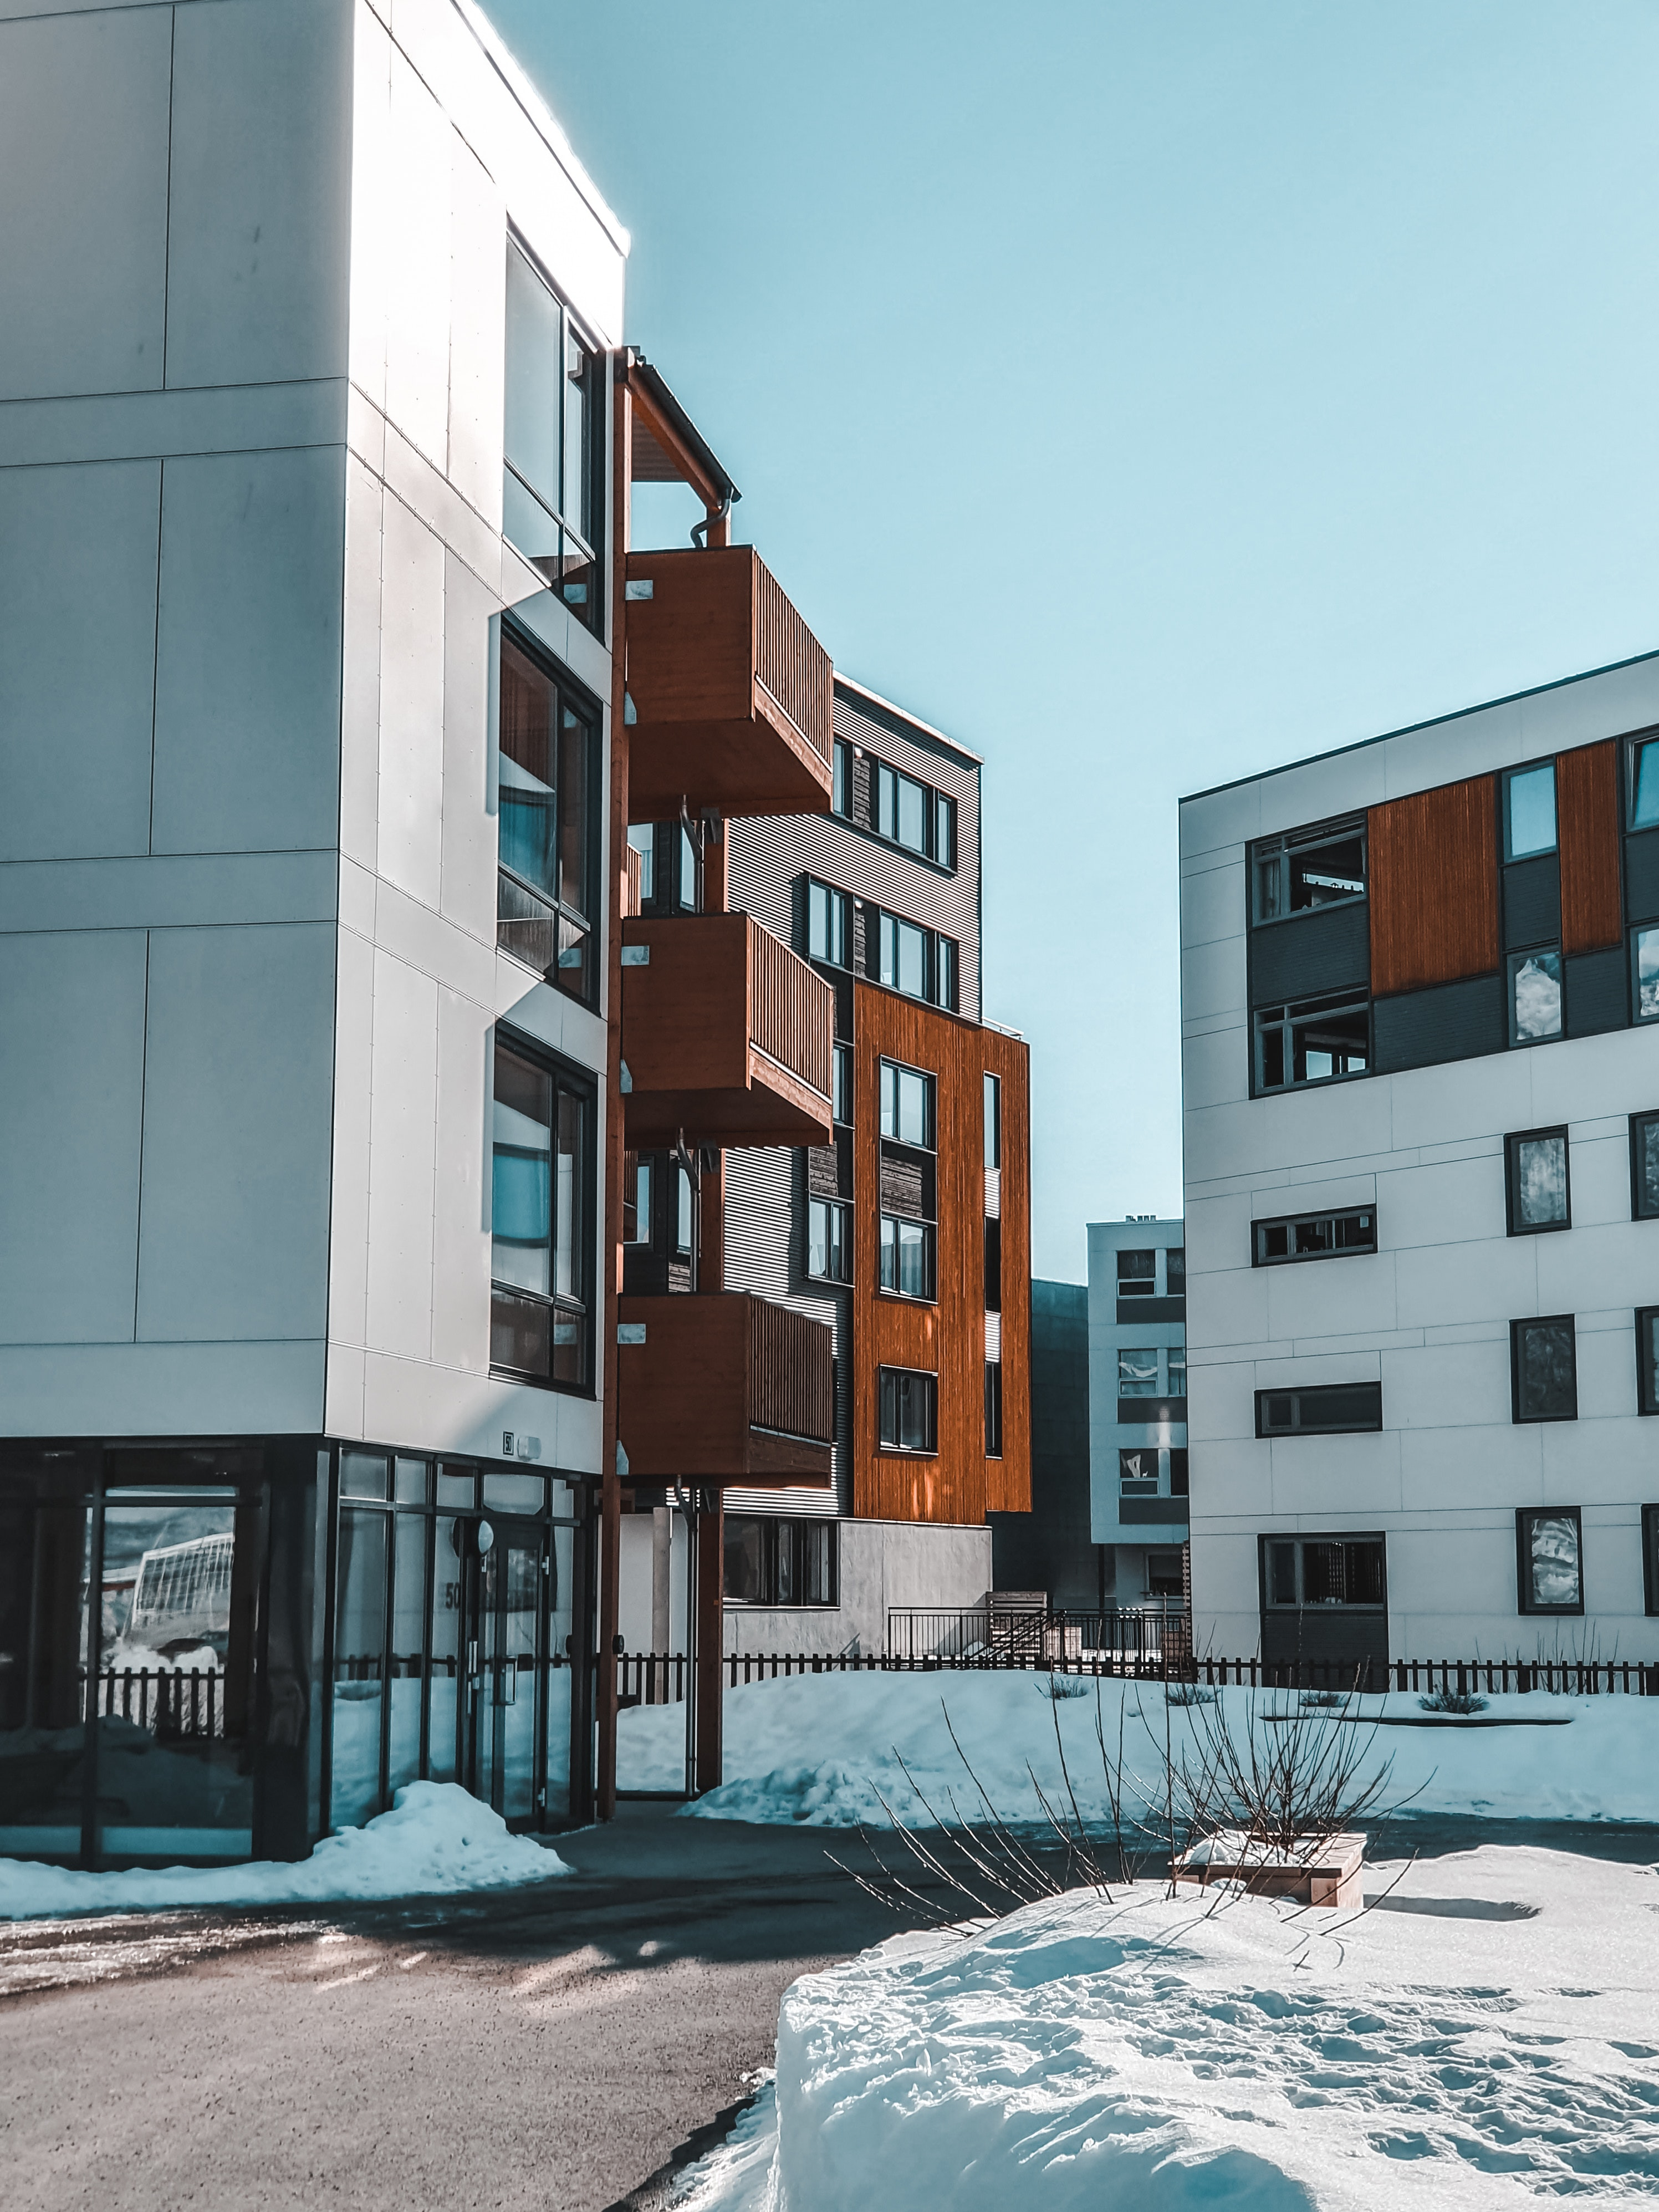 apartments-architectural-design-architecture-2119714